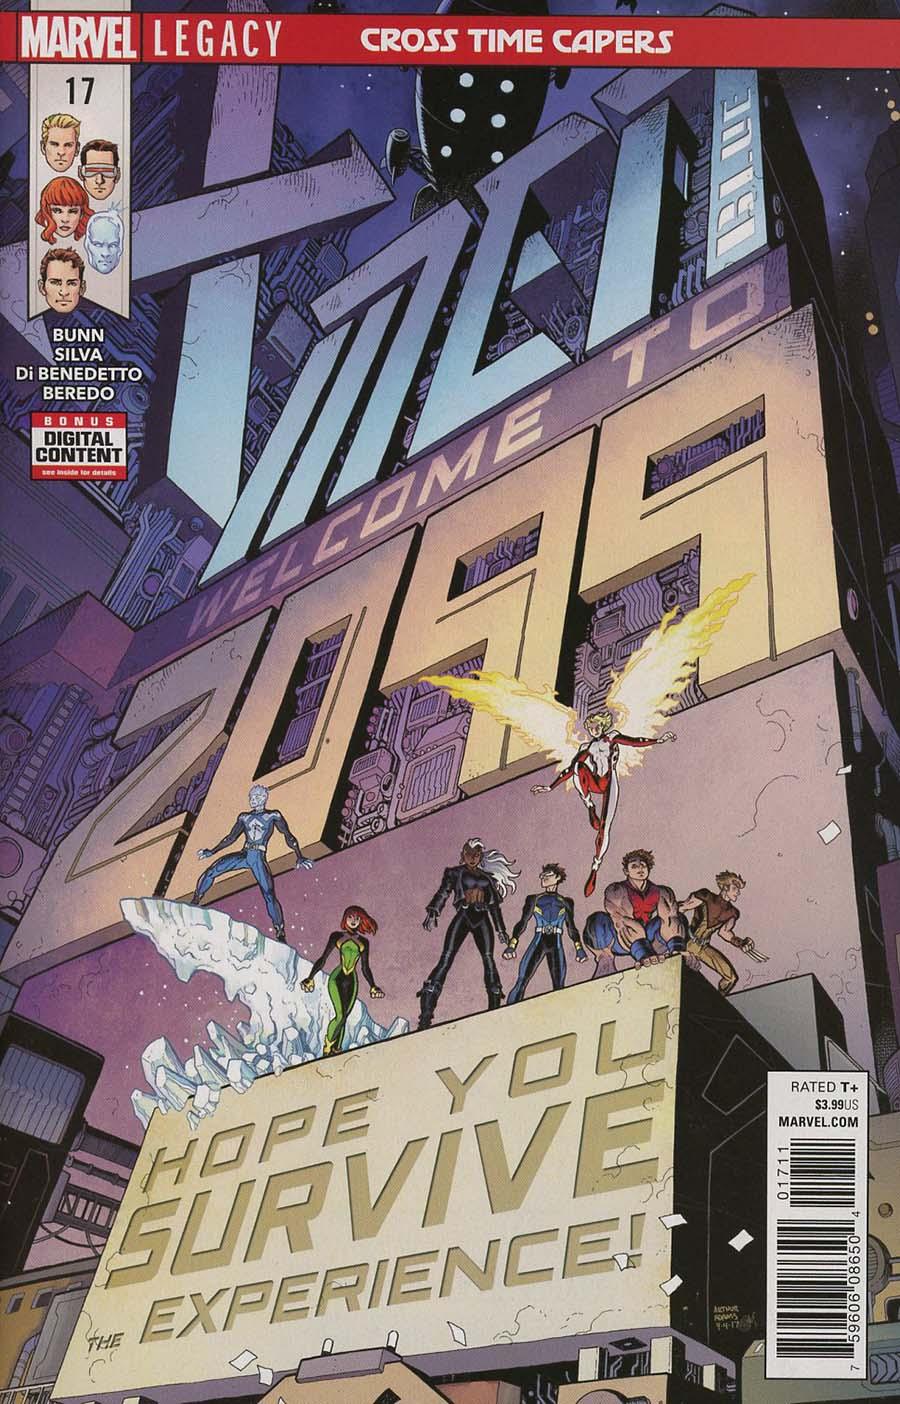 X-Men Blue #17 (Marvel Legacy Tie-In)